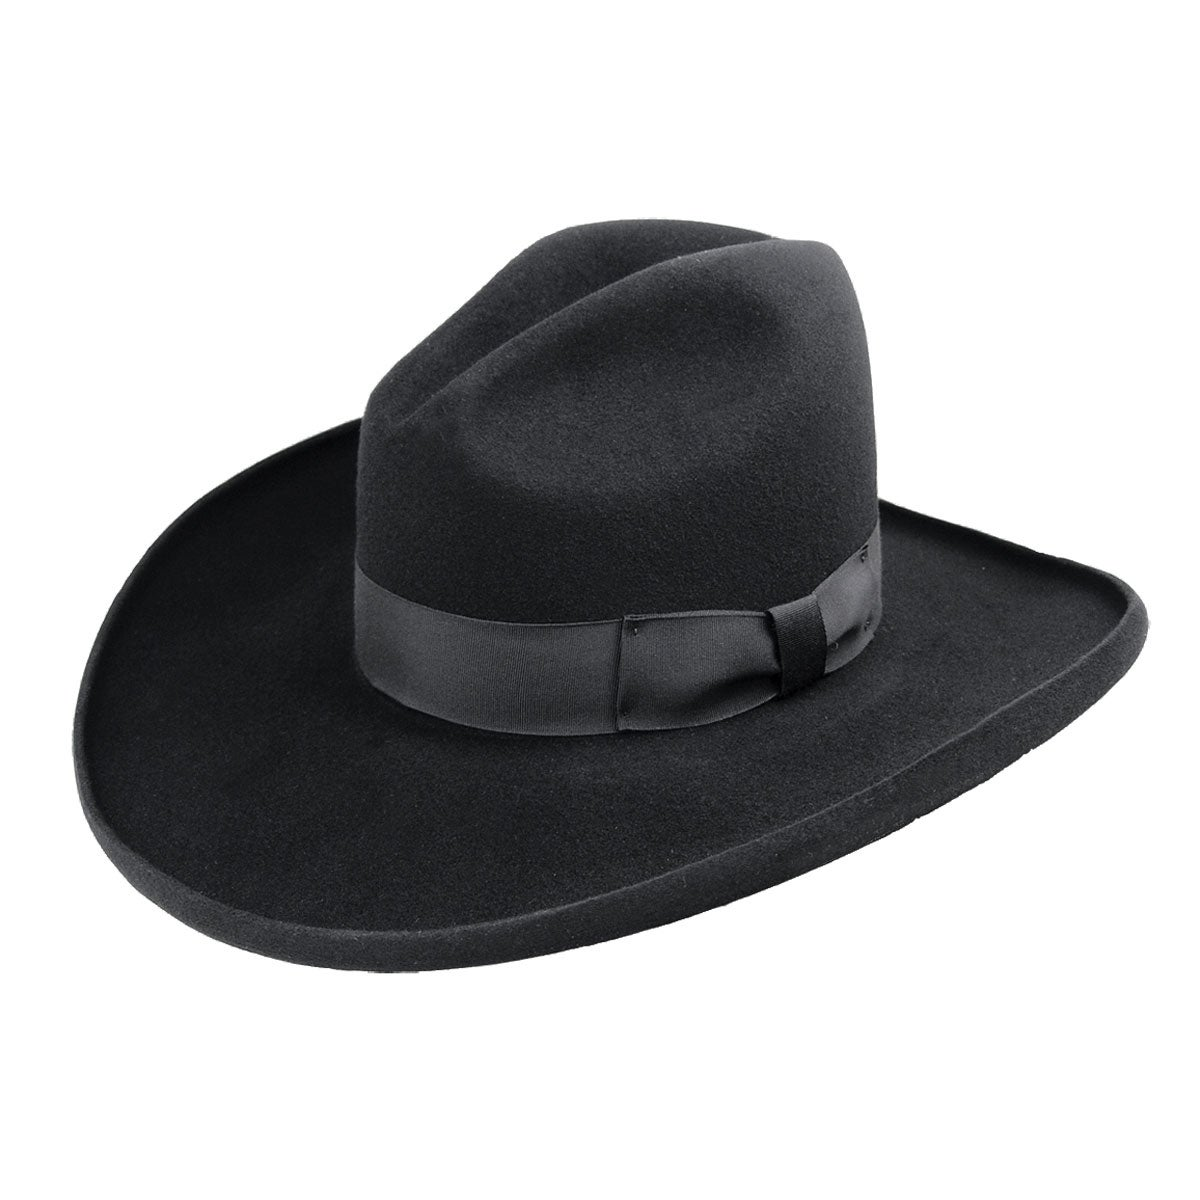 Bailey Western Clayton Western Hat in Black